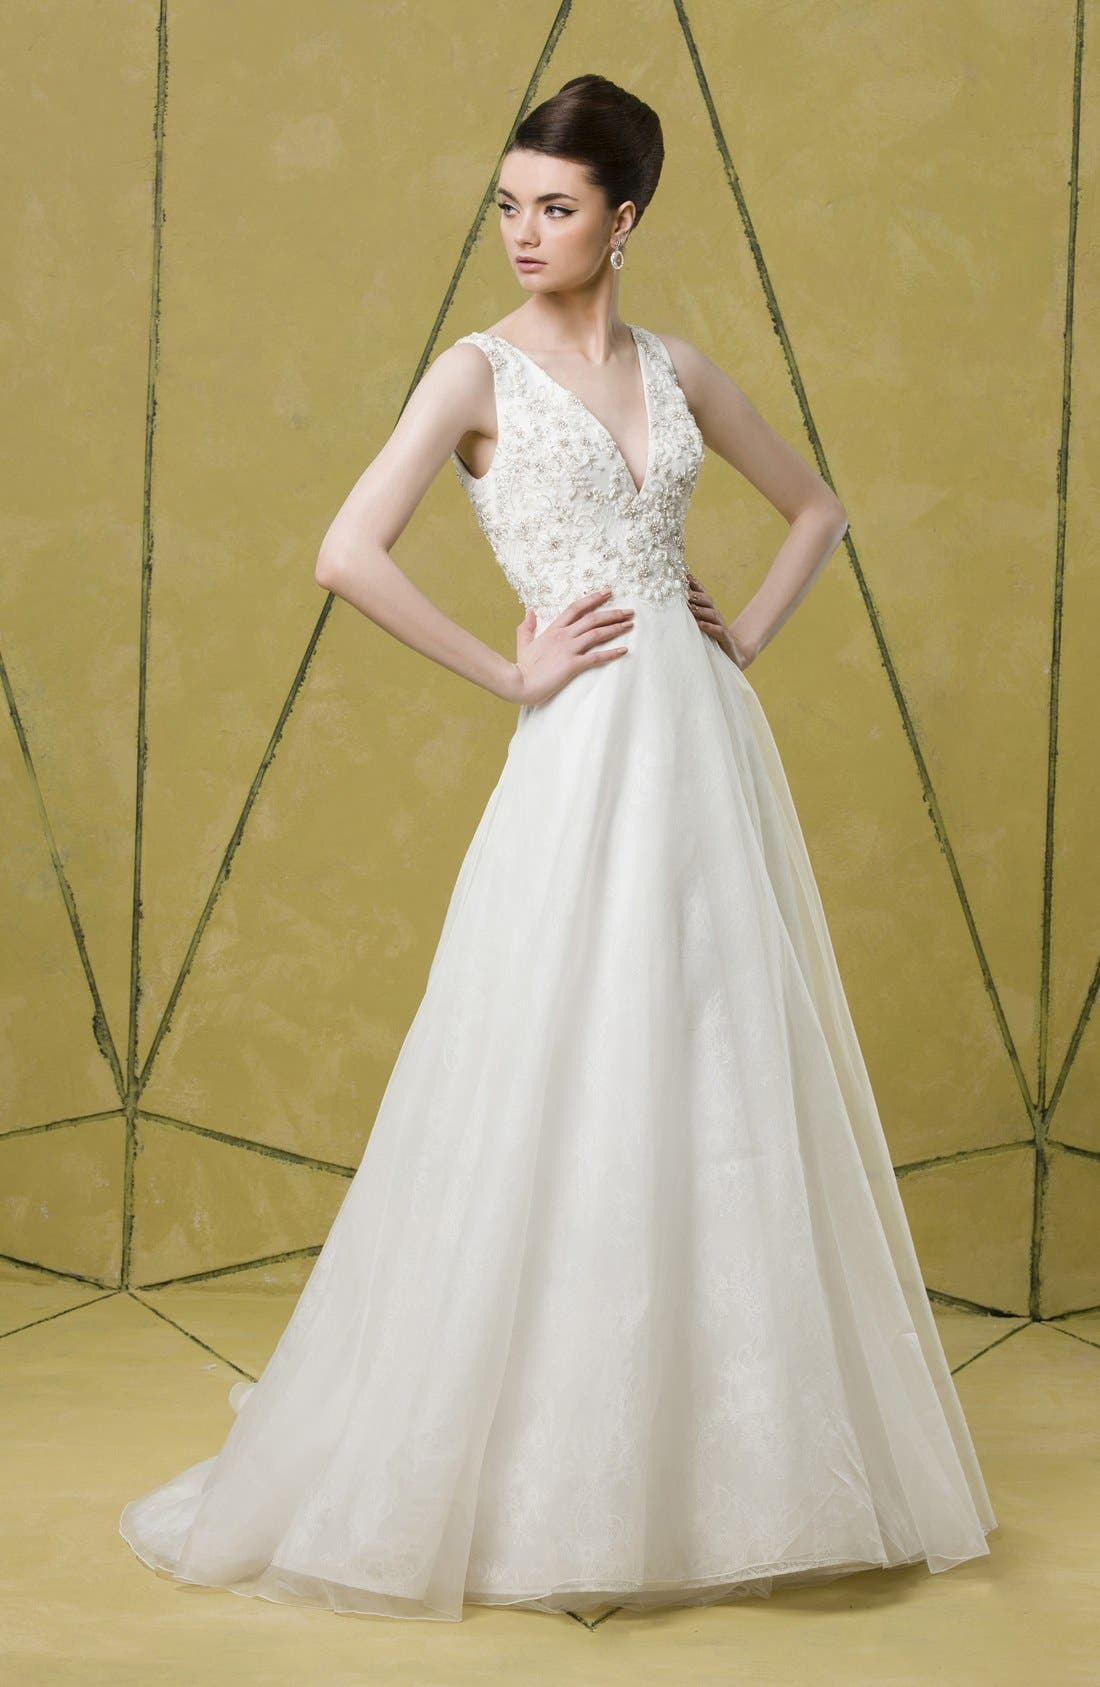 Alternate Image 4  - Badgley Mischka Bridal 'Lana' Embellished Silk Organza Dress (In Stores Only)